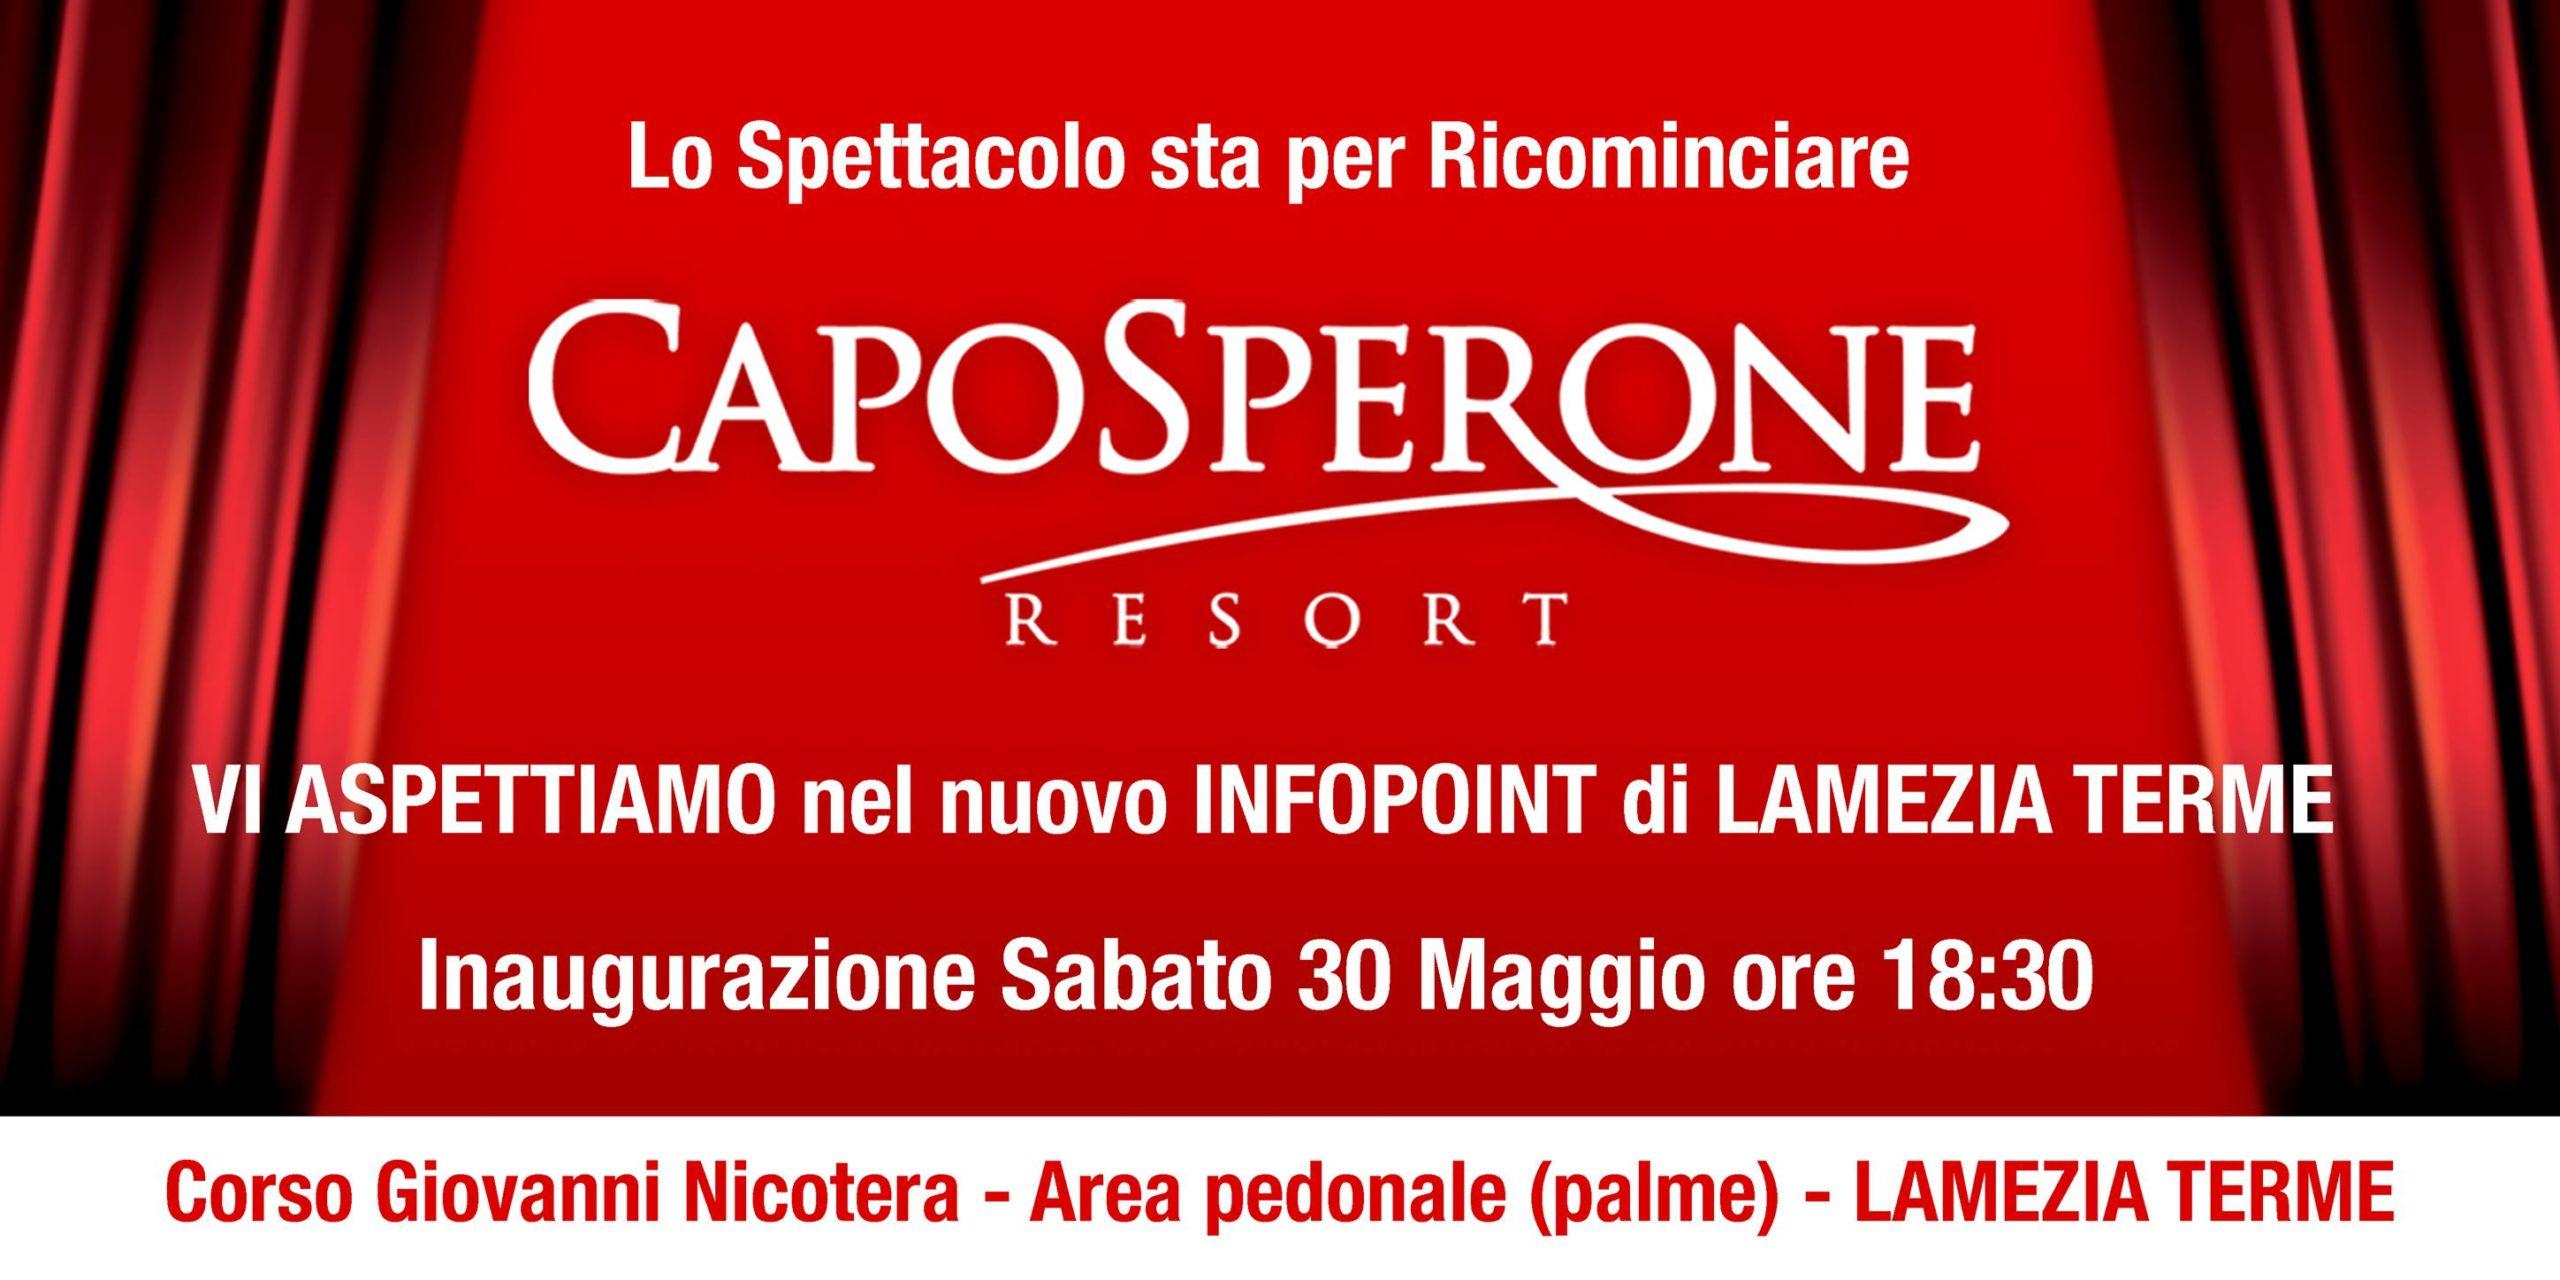 Infopoint Lamezia Terme Caposperone